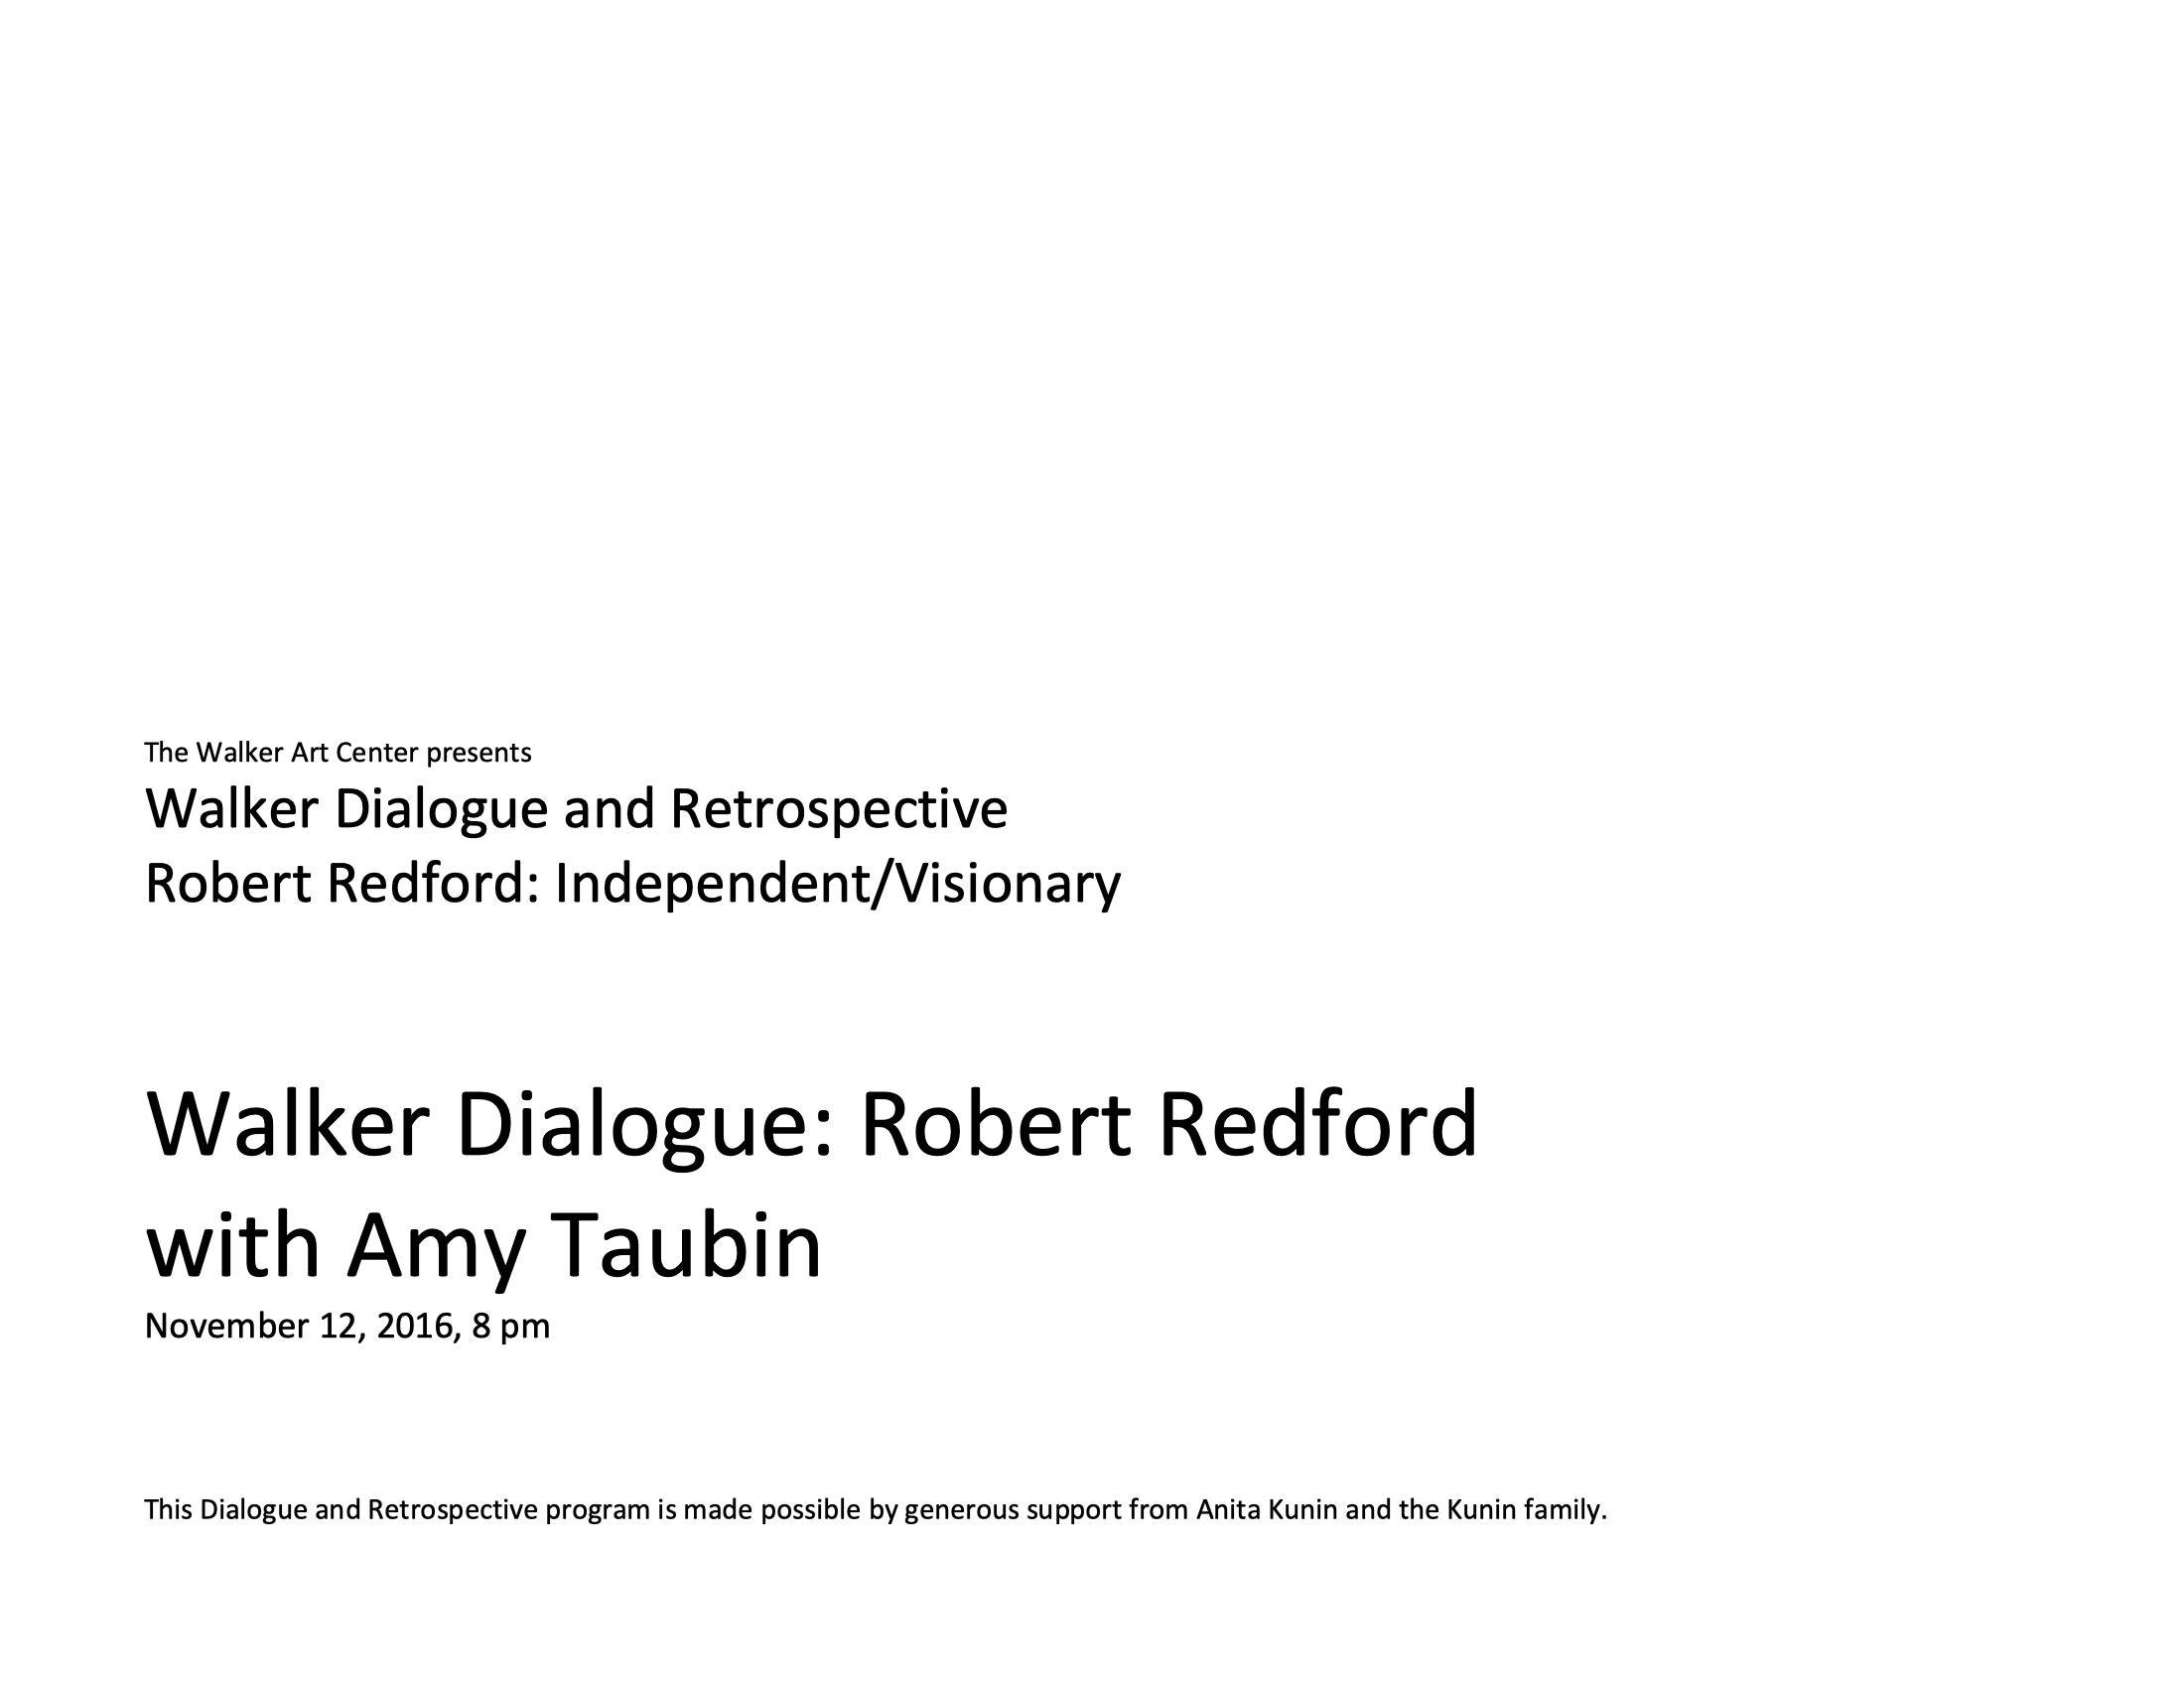 Robert Redford program notes pg1